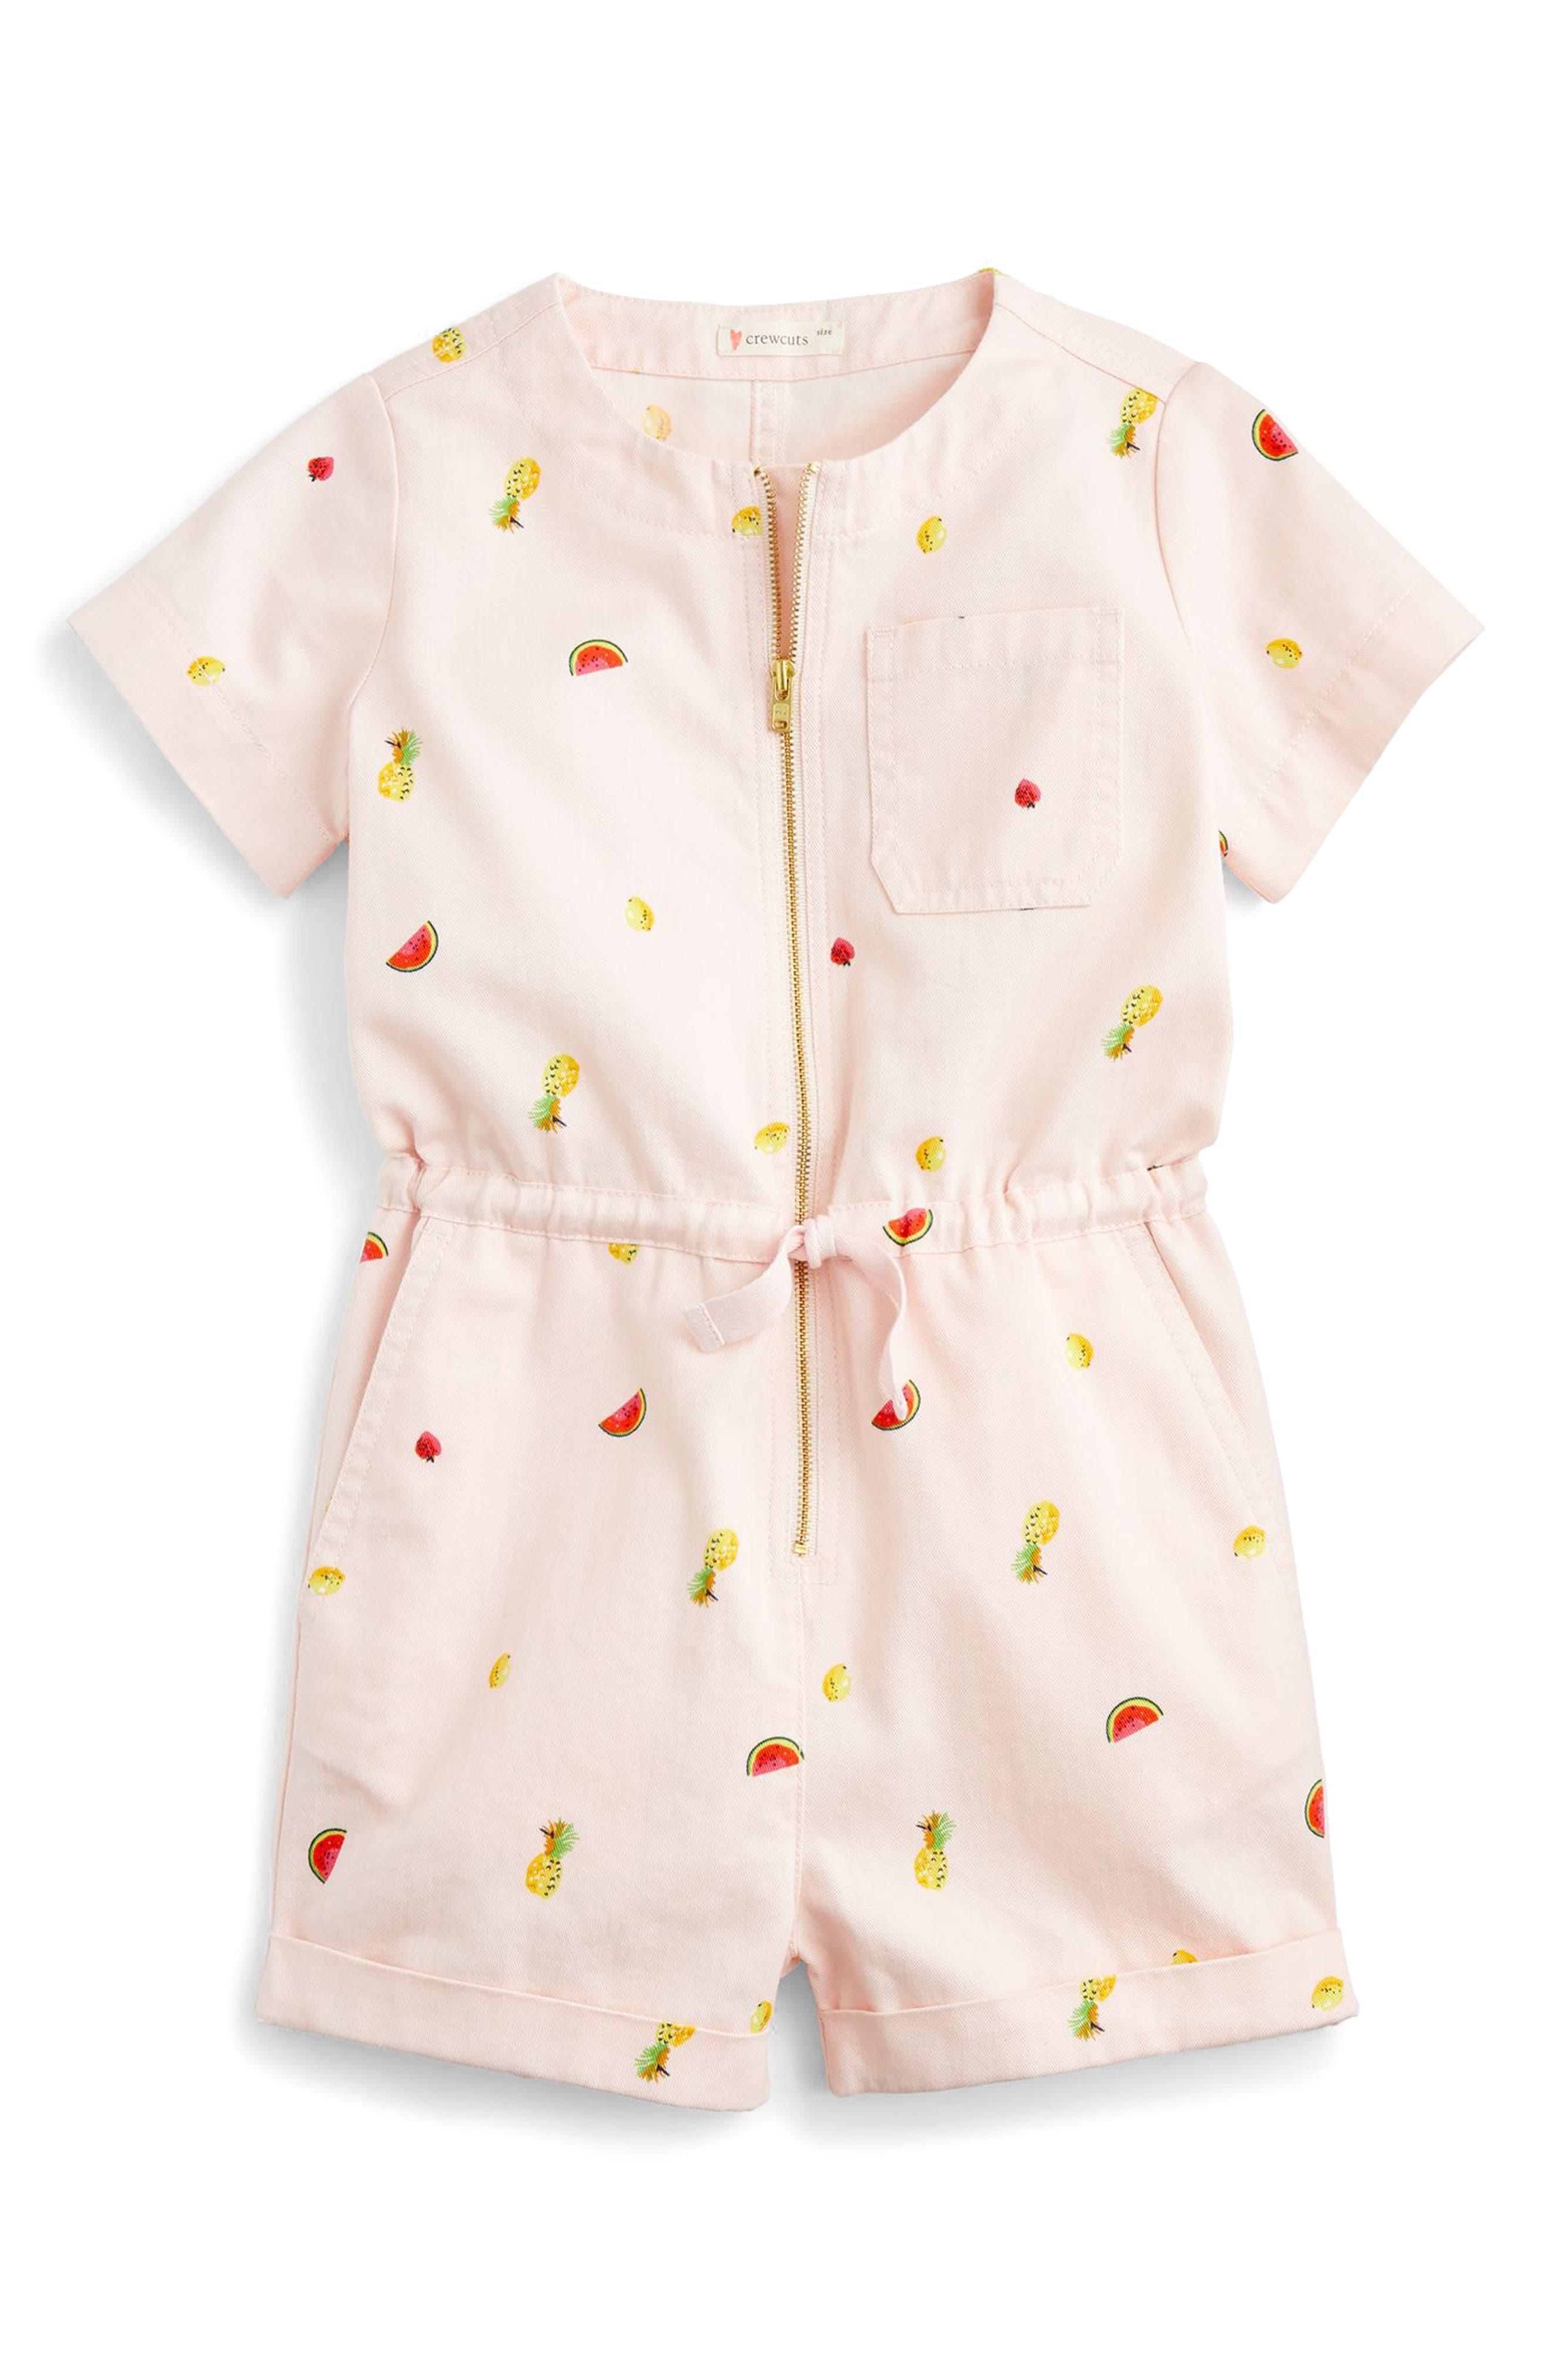 crewcuts by J. Crew Winslow Fruit Salad Romper (Toddler Girls, Little Girls & Big Girls)